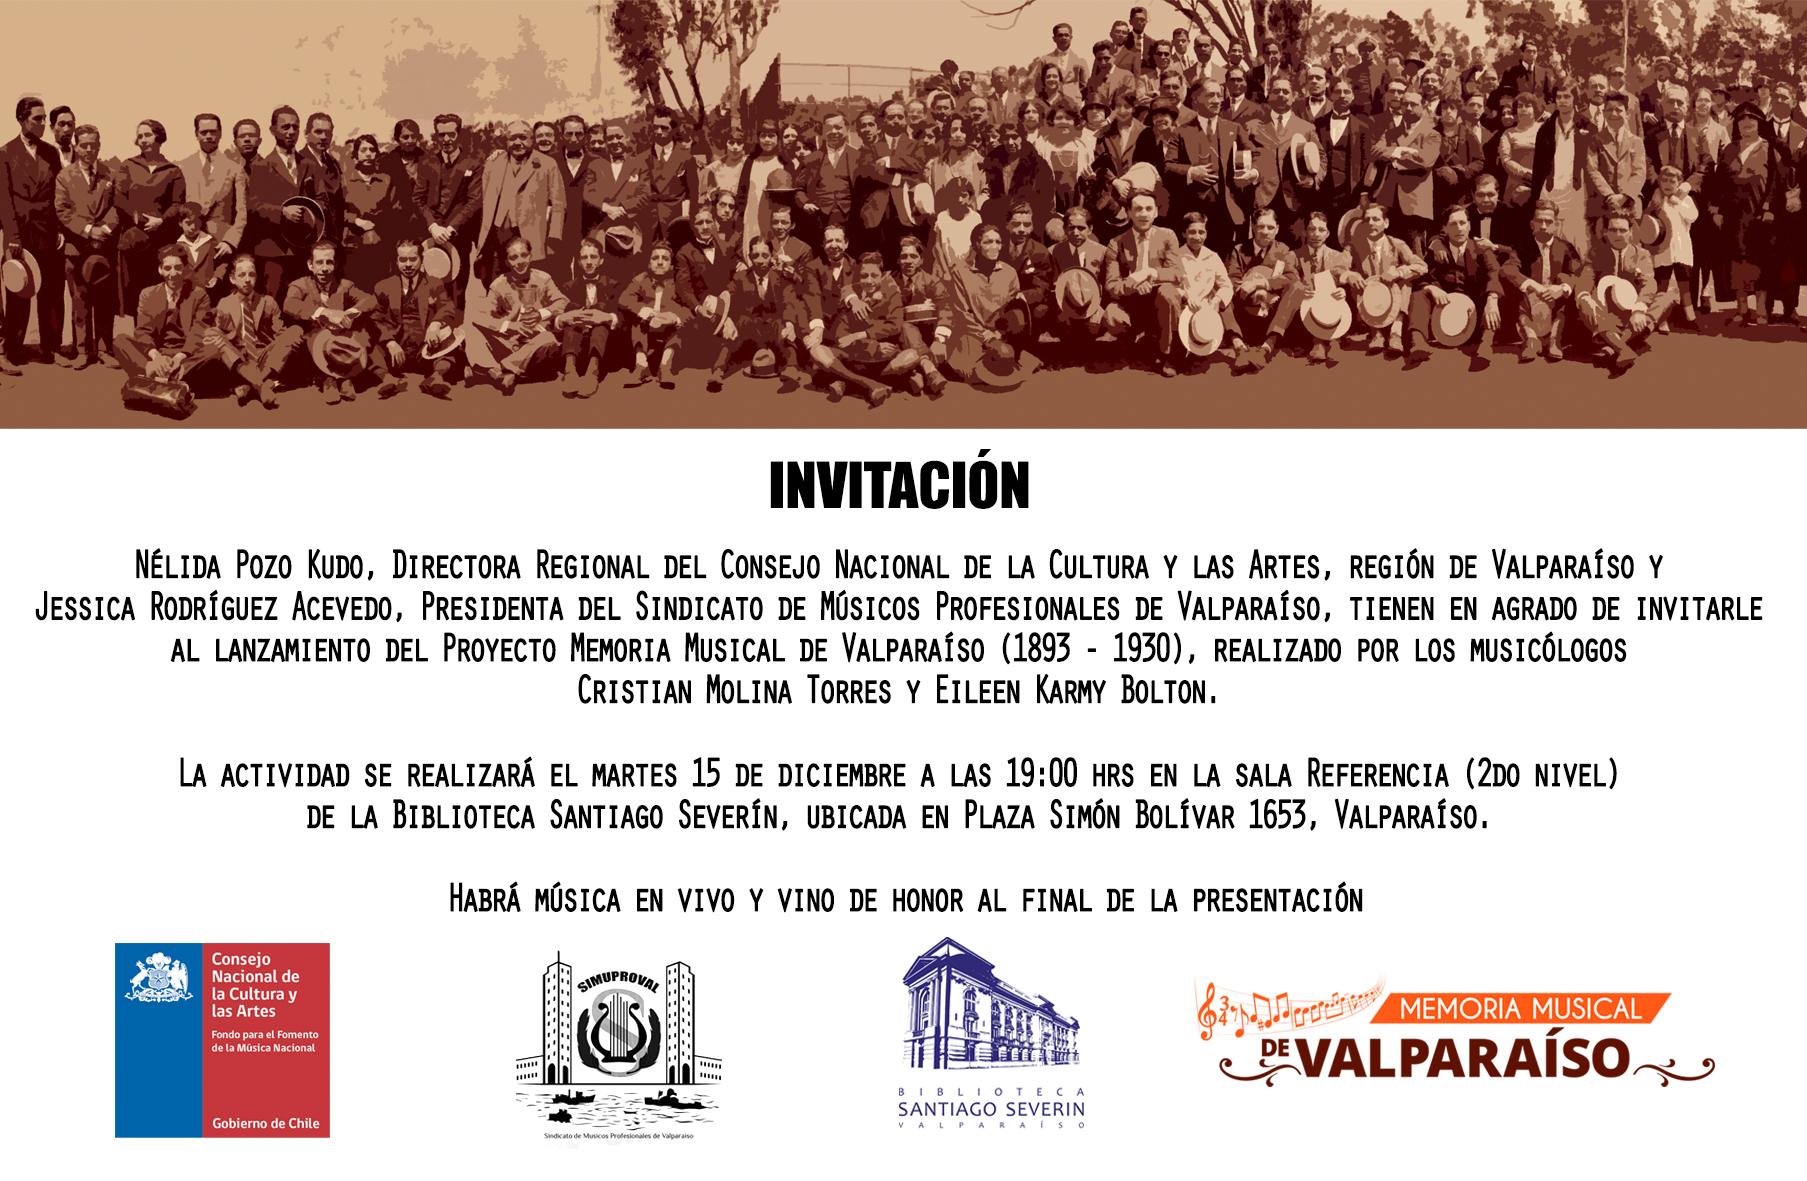 Invitación lanzamiento Memoria Musical de Valparaíso